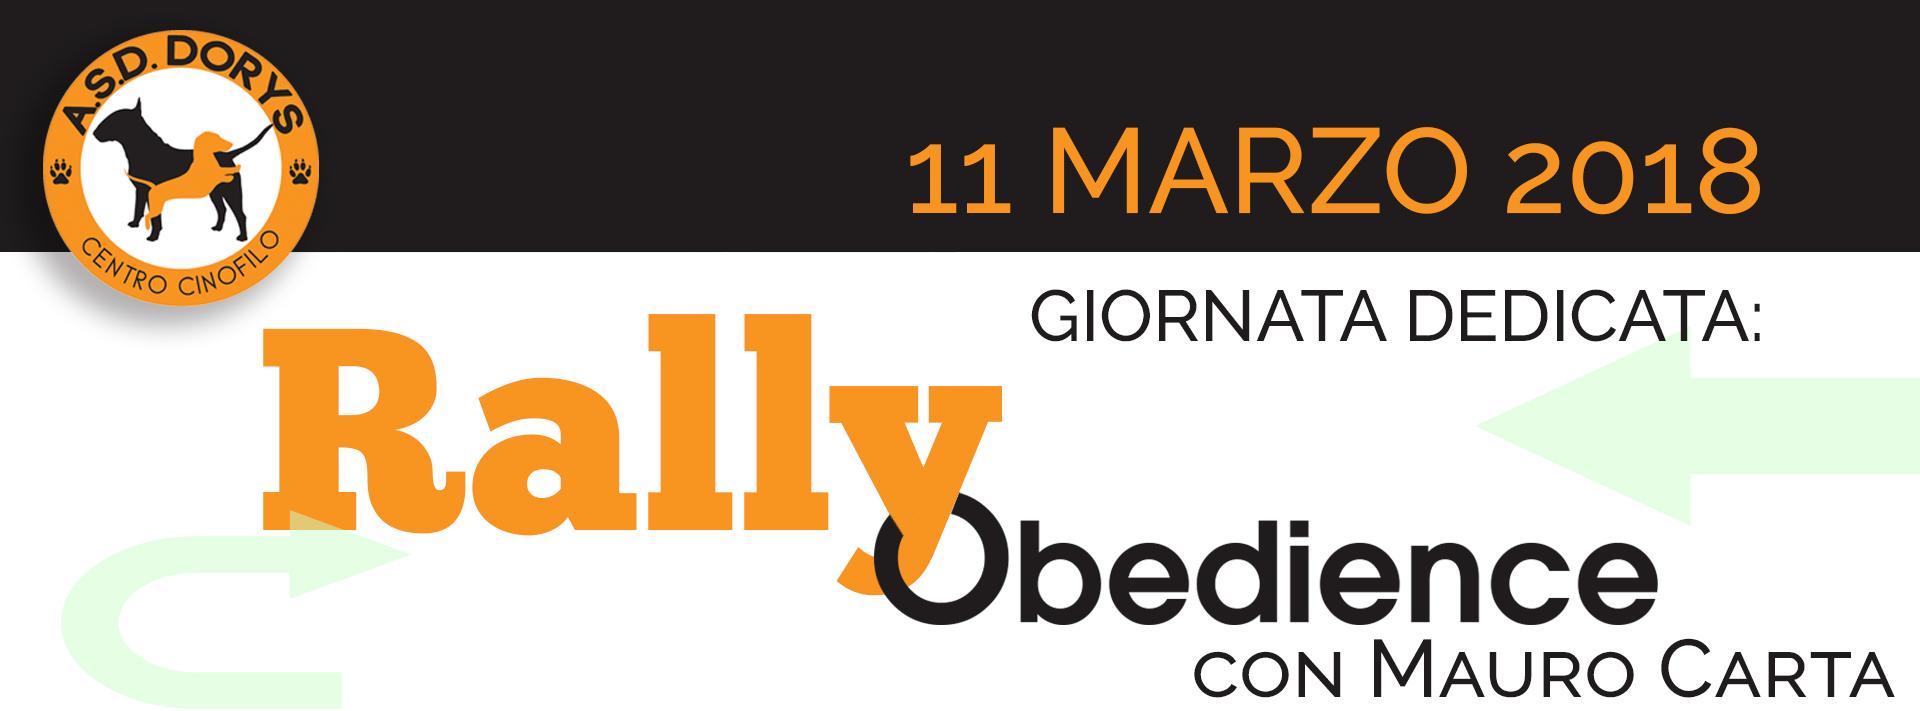 rally obedience 11 marzo asd dorys